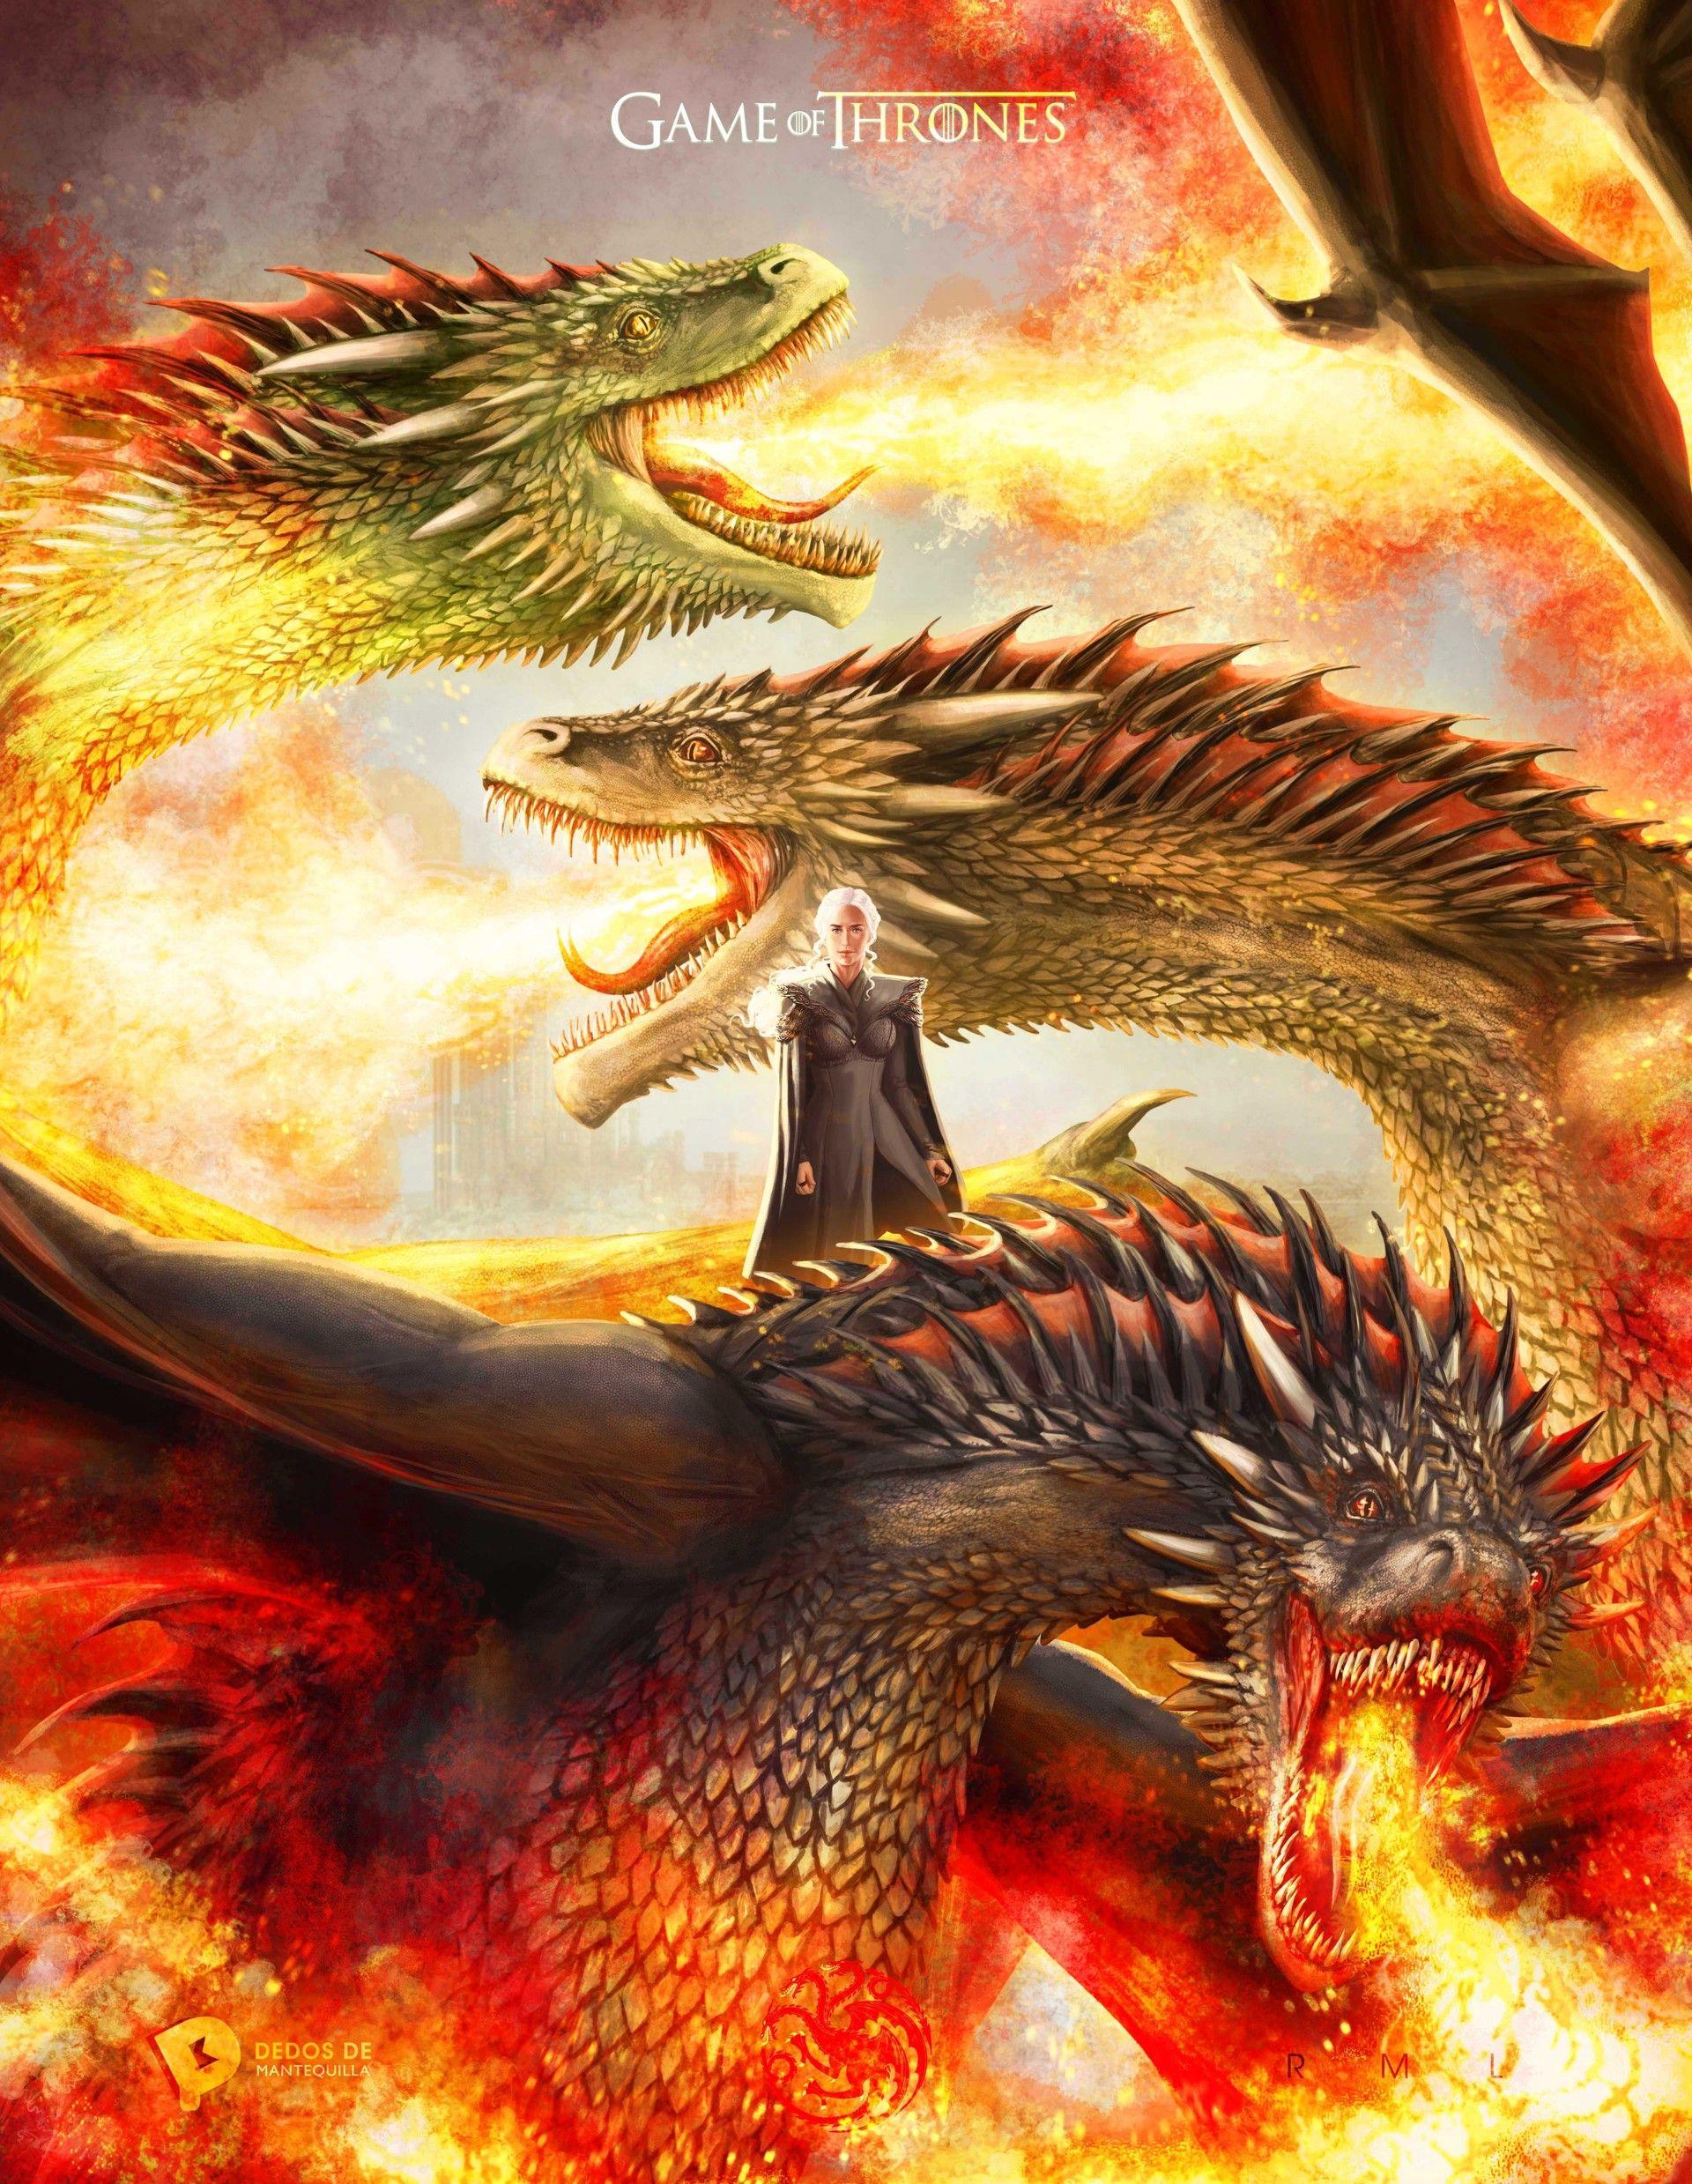 Dragon S Crown Gets New Character Art Screens Tarot: Mother Of Dragons, Rocio Mariana López